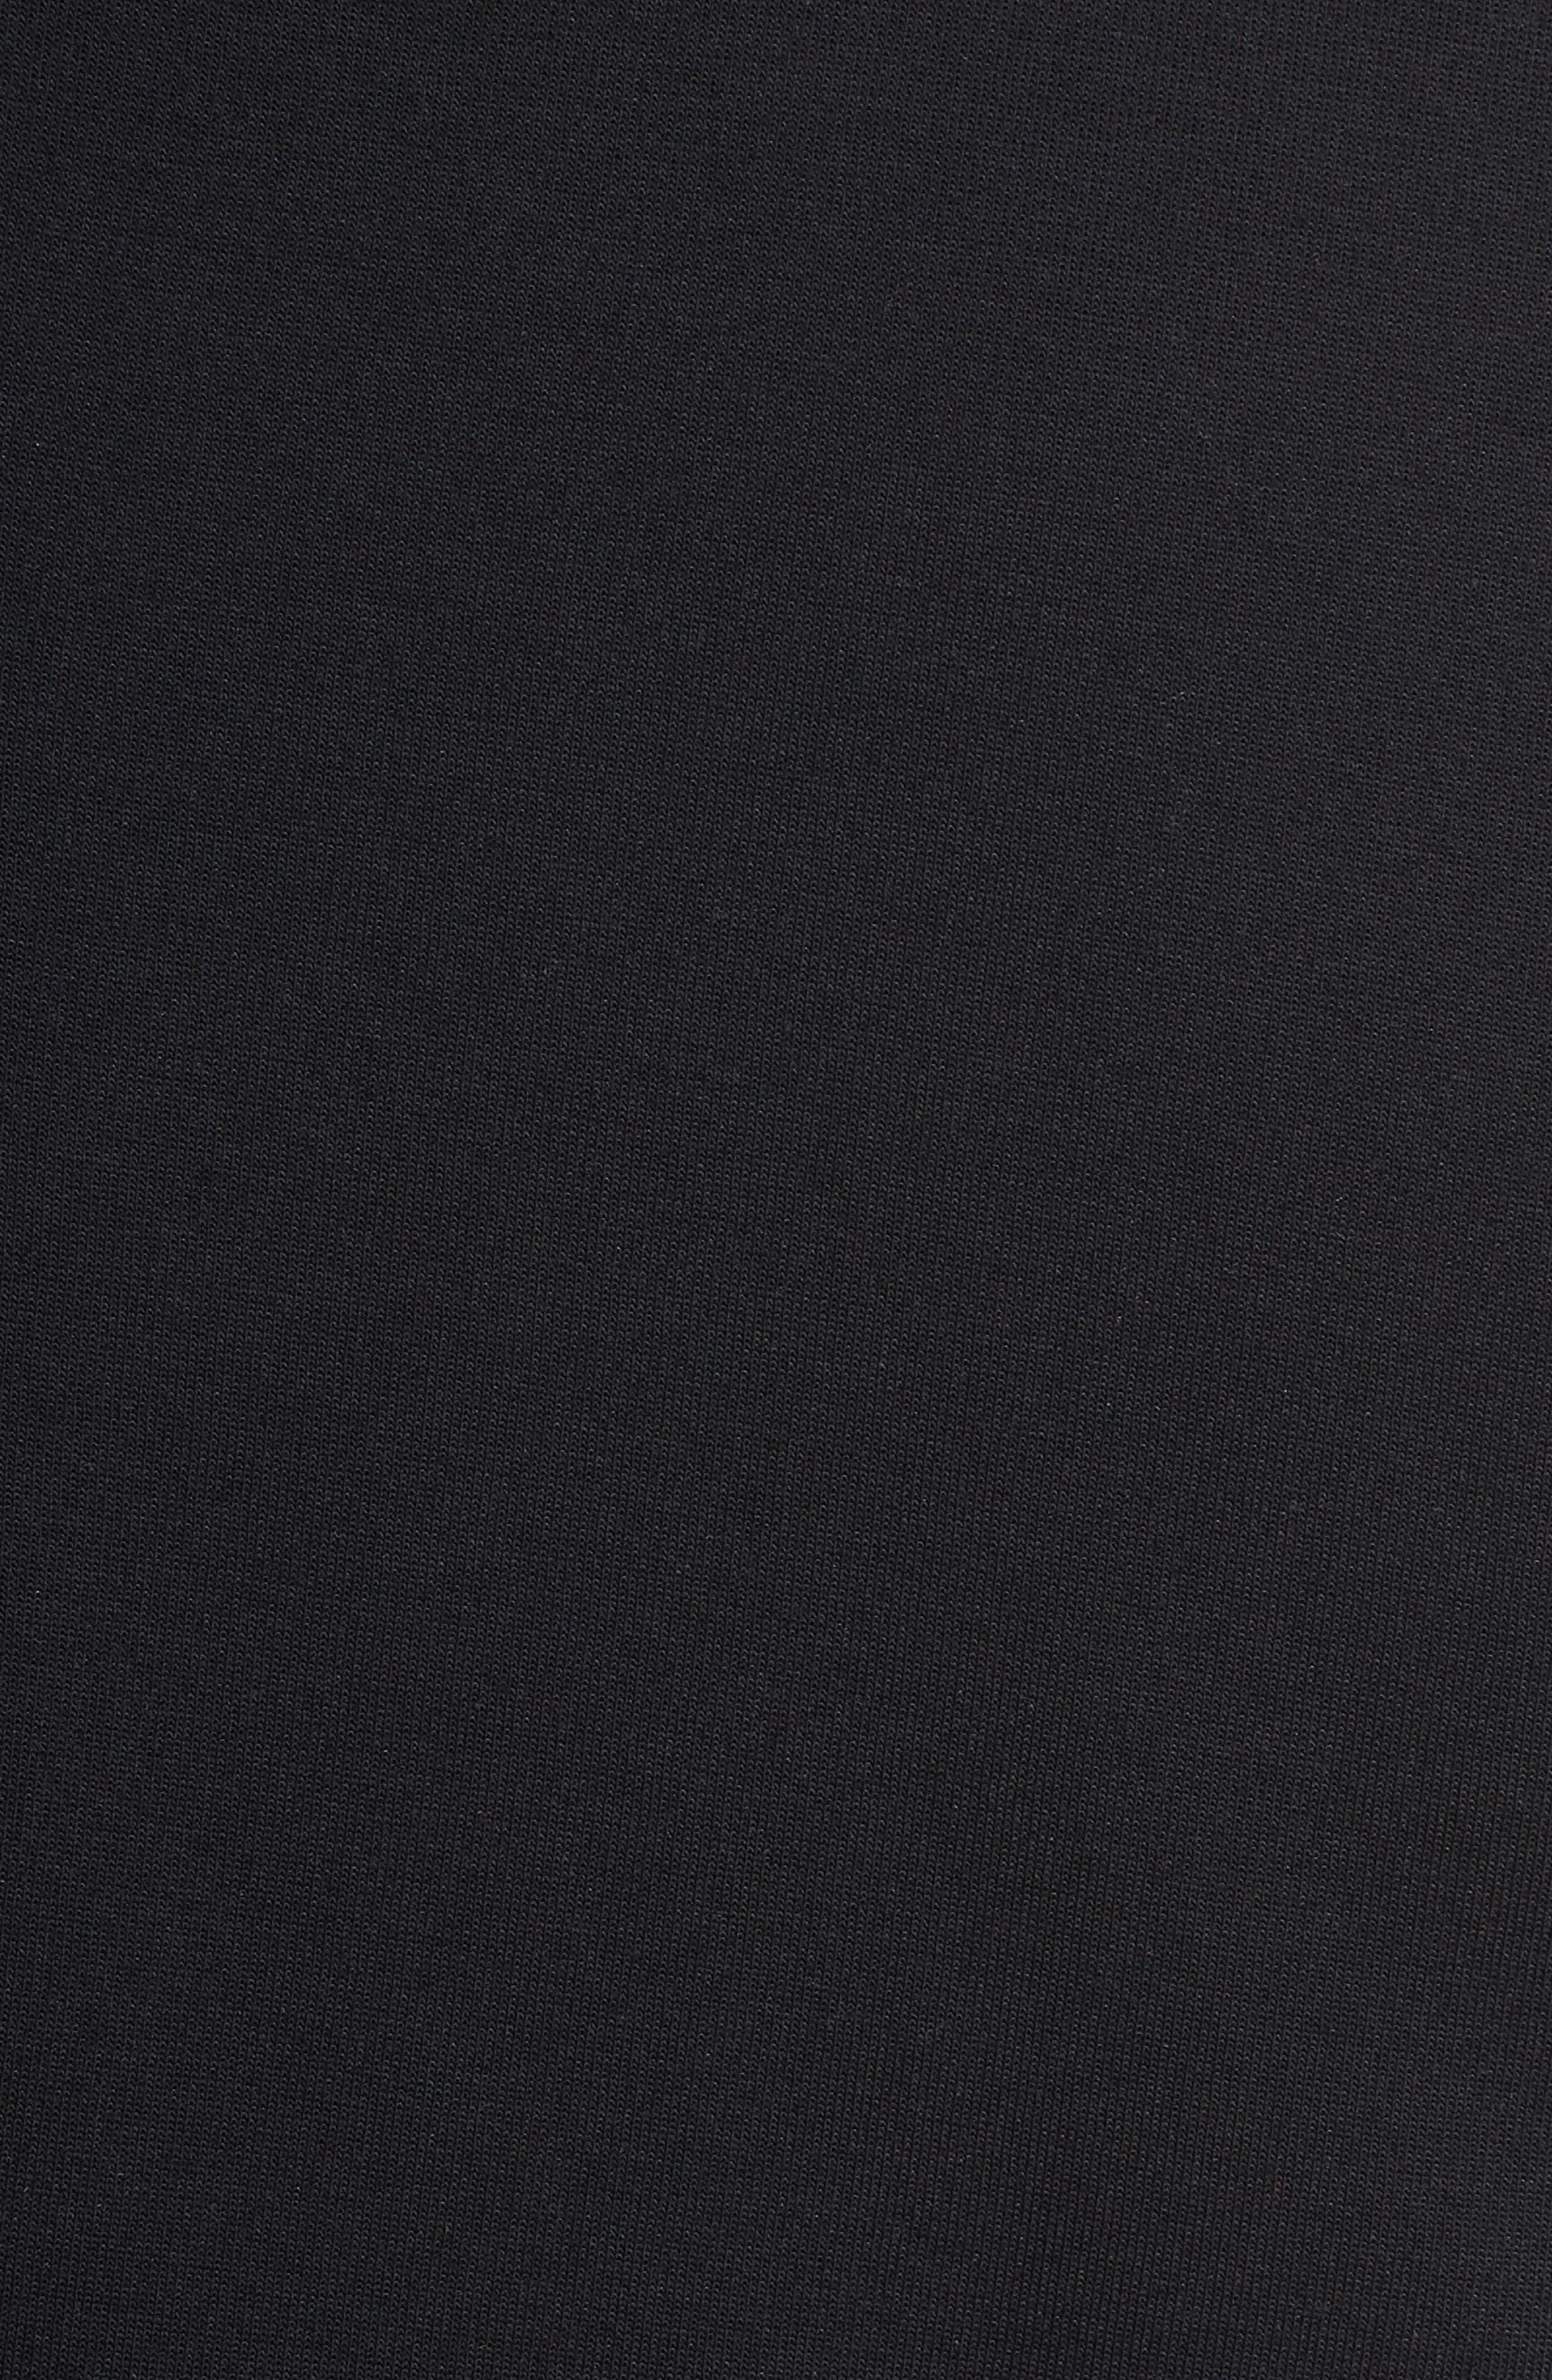 Sportswear Tech Fleece Cape Jacket,                             Alternate thumbnail 6, color,                             BLACK/ WHITE